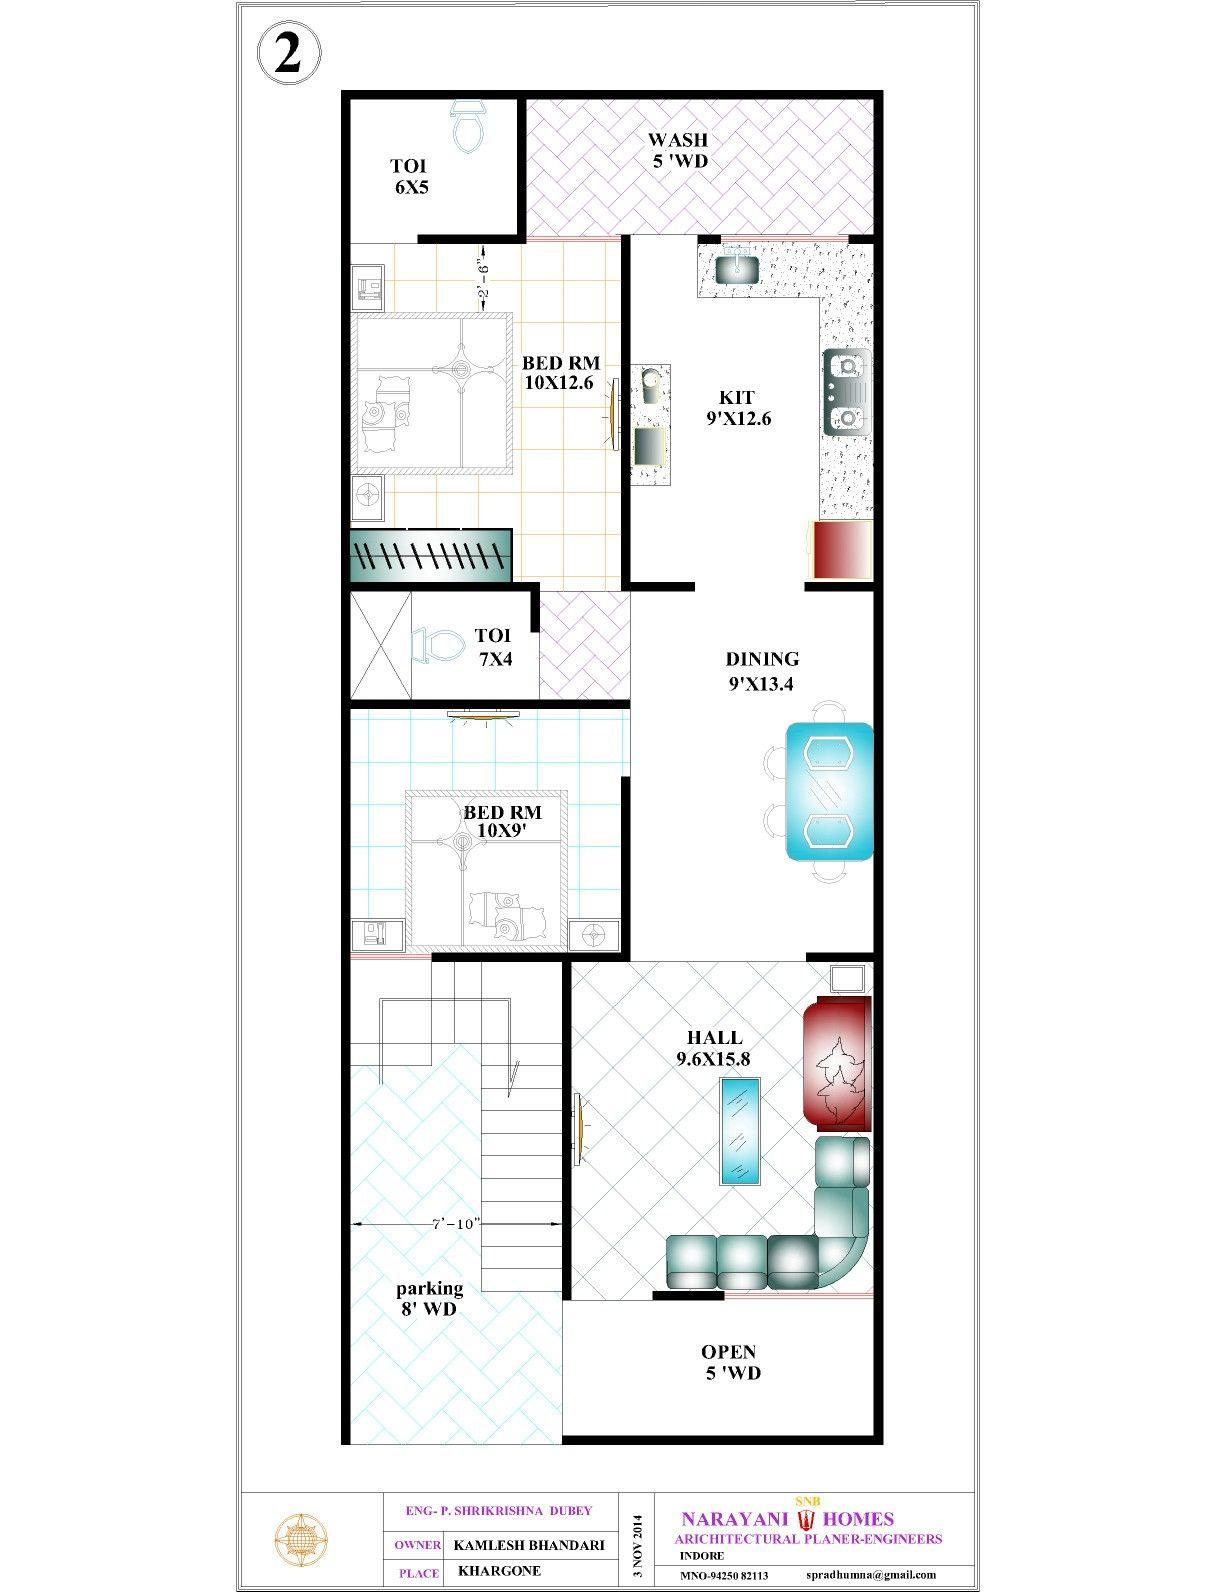 house plans home map design plan bed also pin by ashraf peinter on rh pinterest